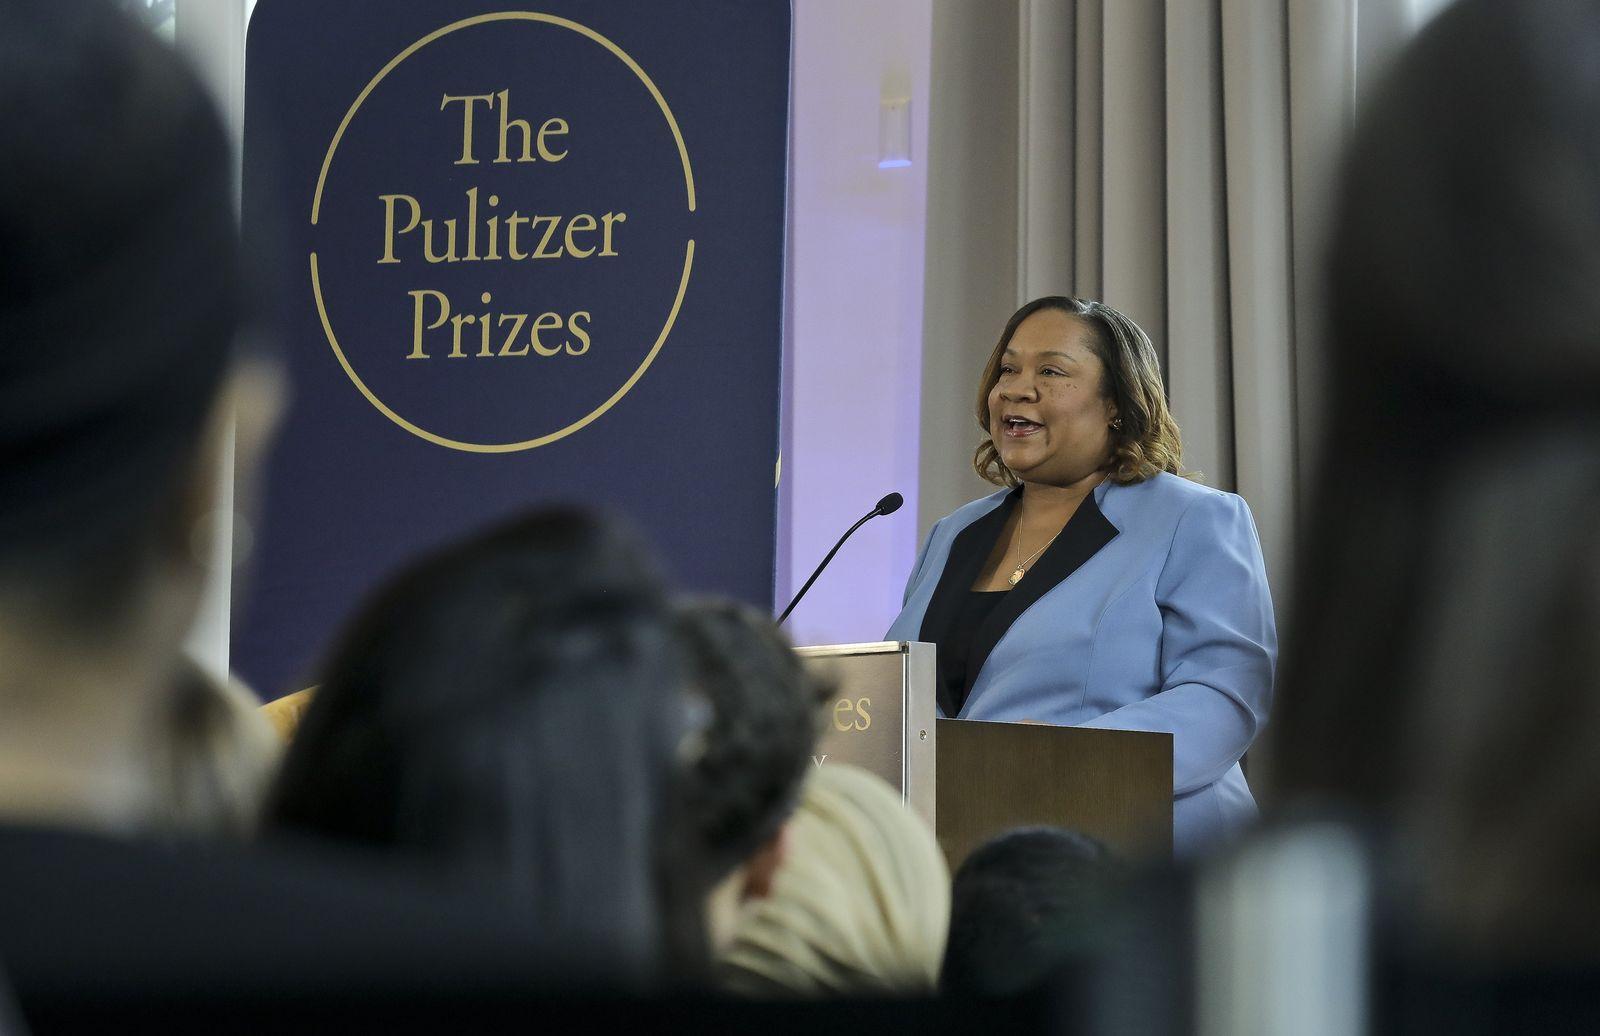 Pulitzerpreis